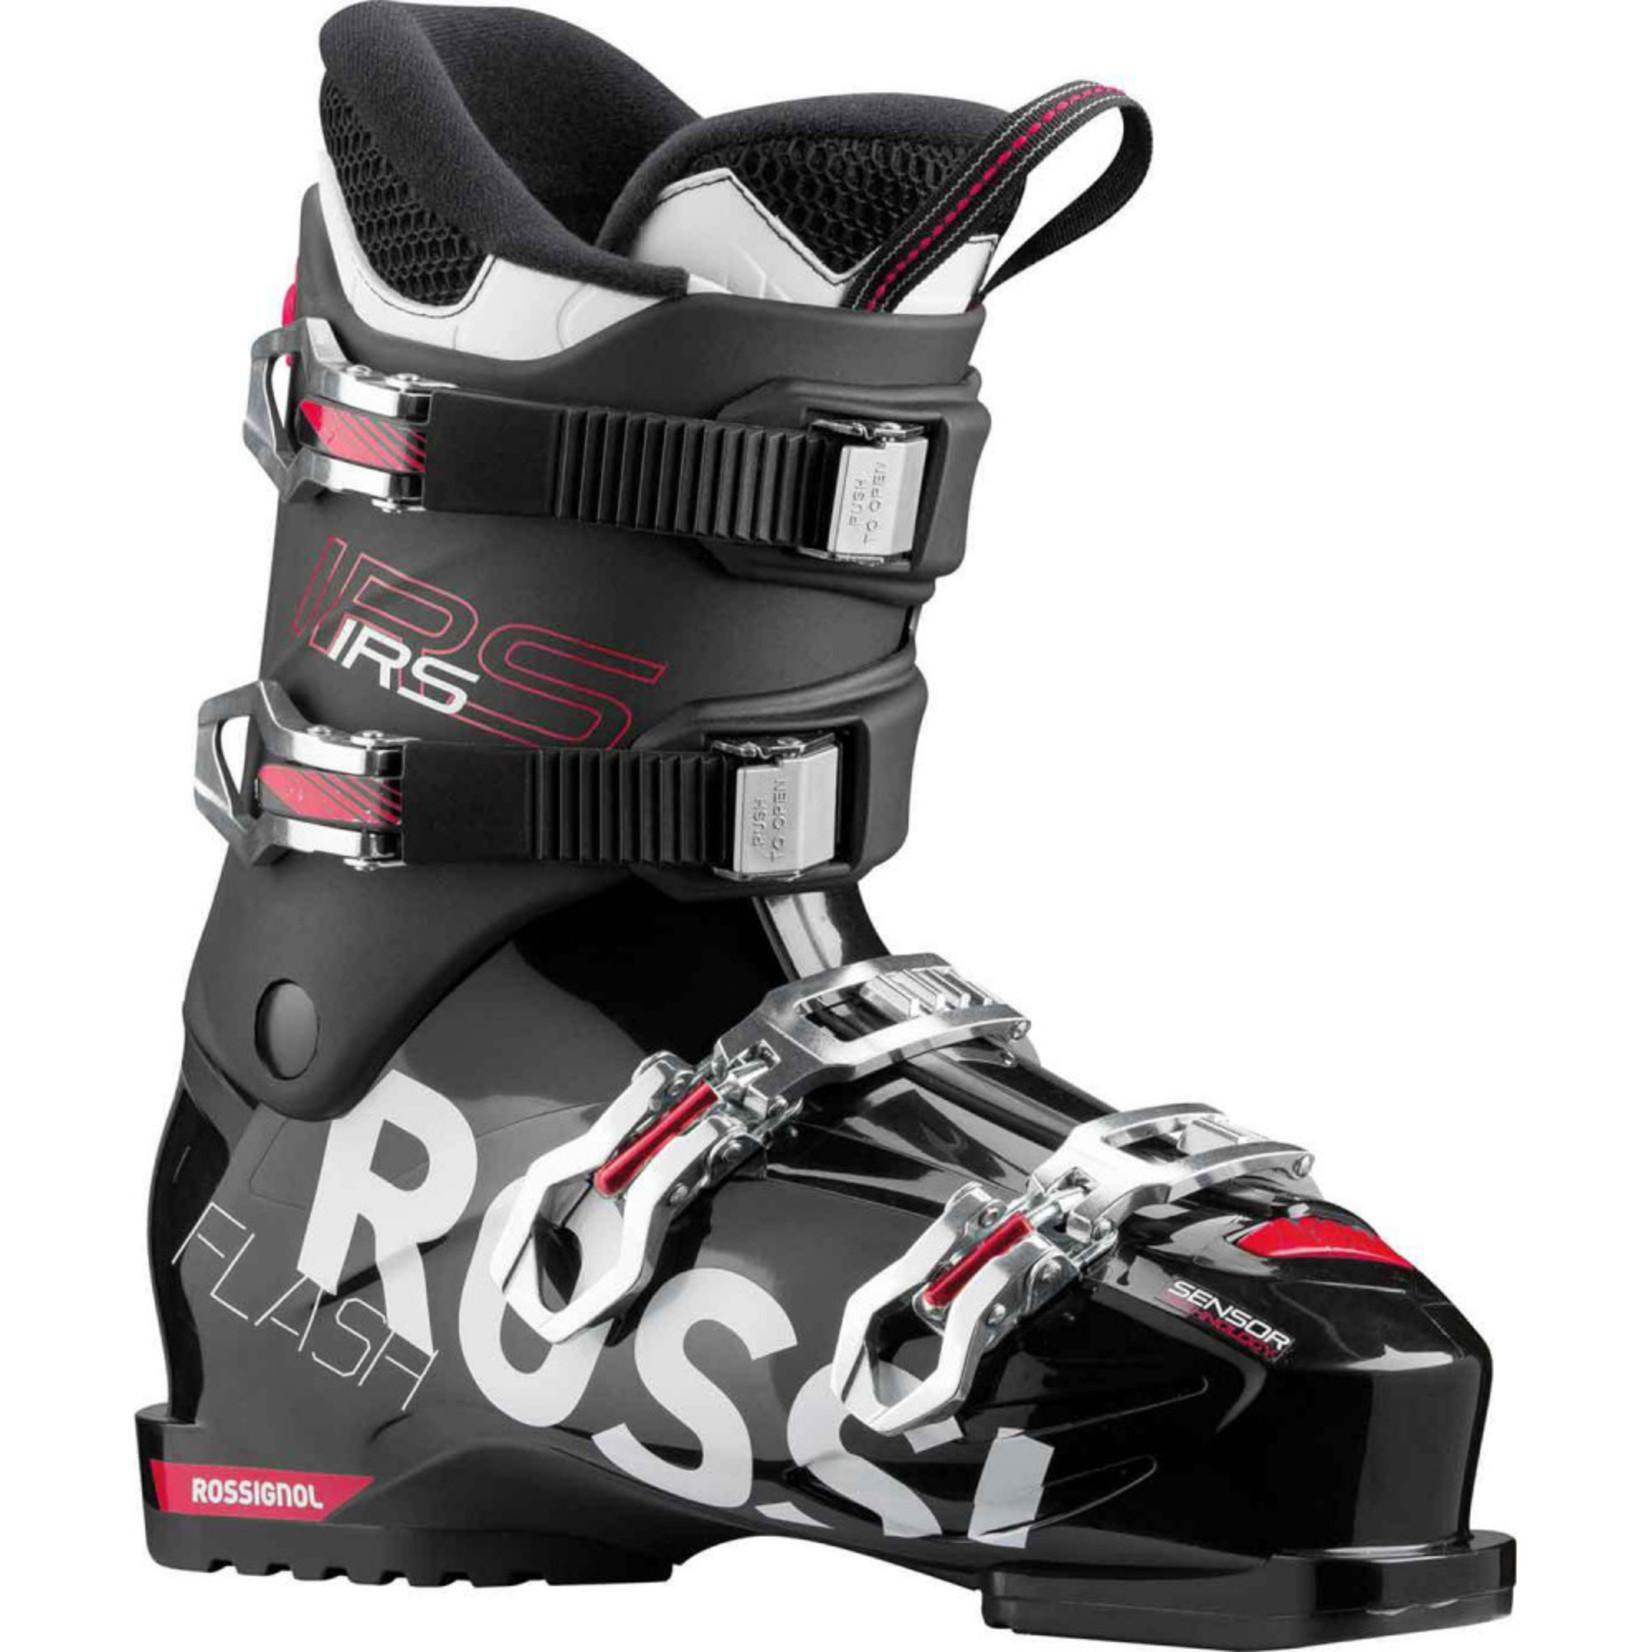 Rossignol Bottes Ski Alpin Rossignol Flash Rental IRS